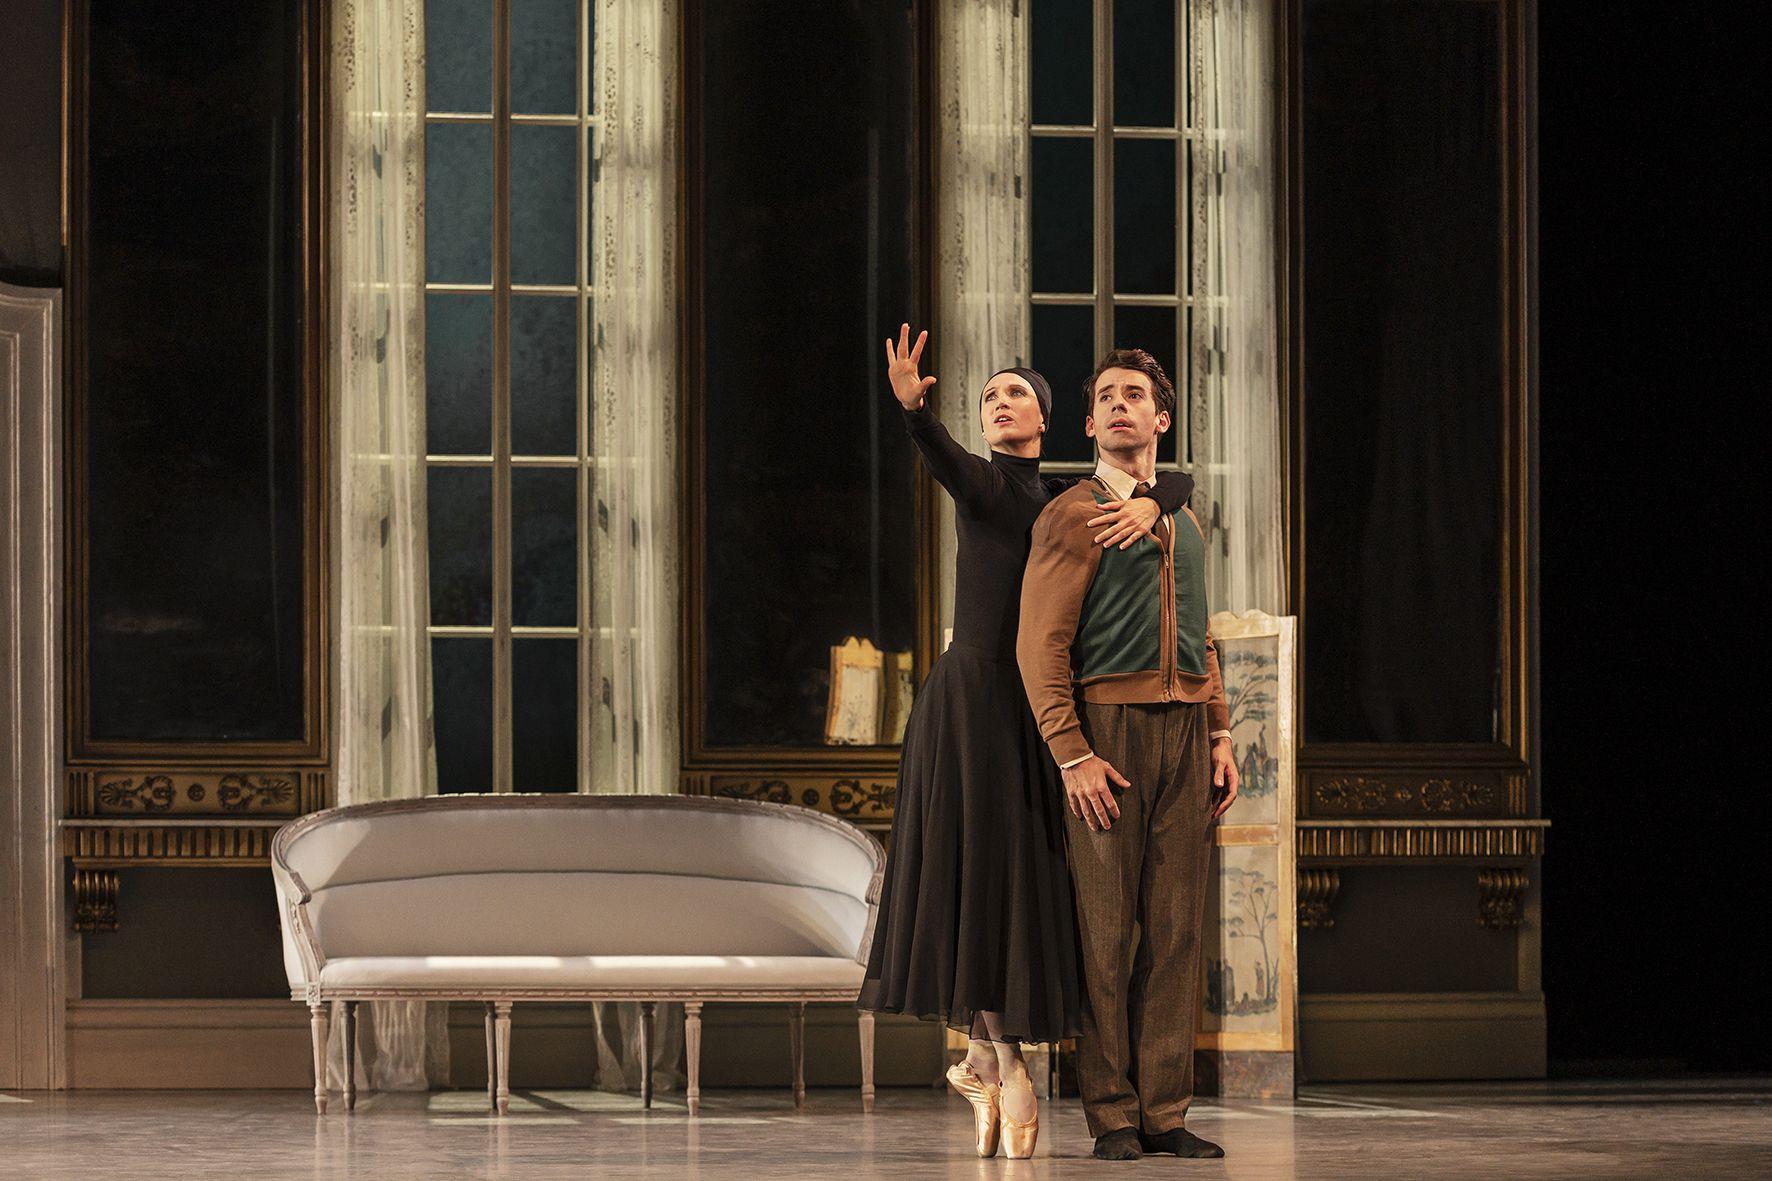 Blixen, teater, ballet, det kongelige teater, karen blixen, forestilling